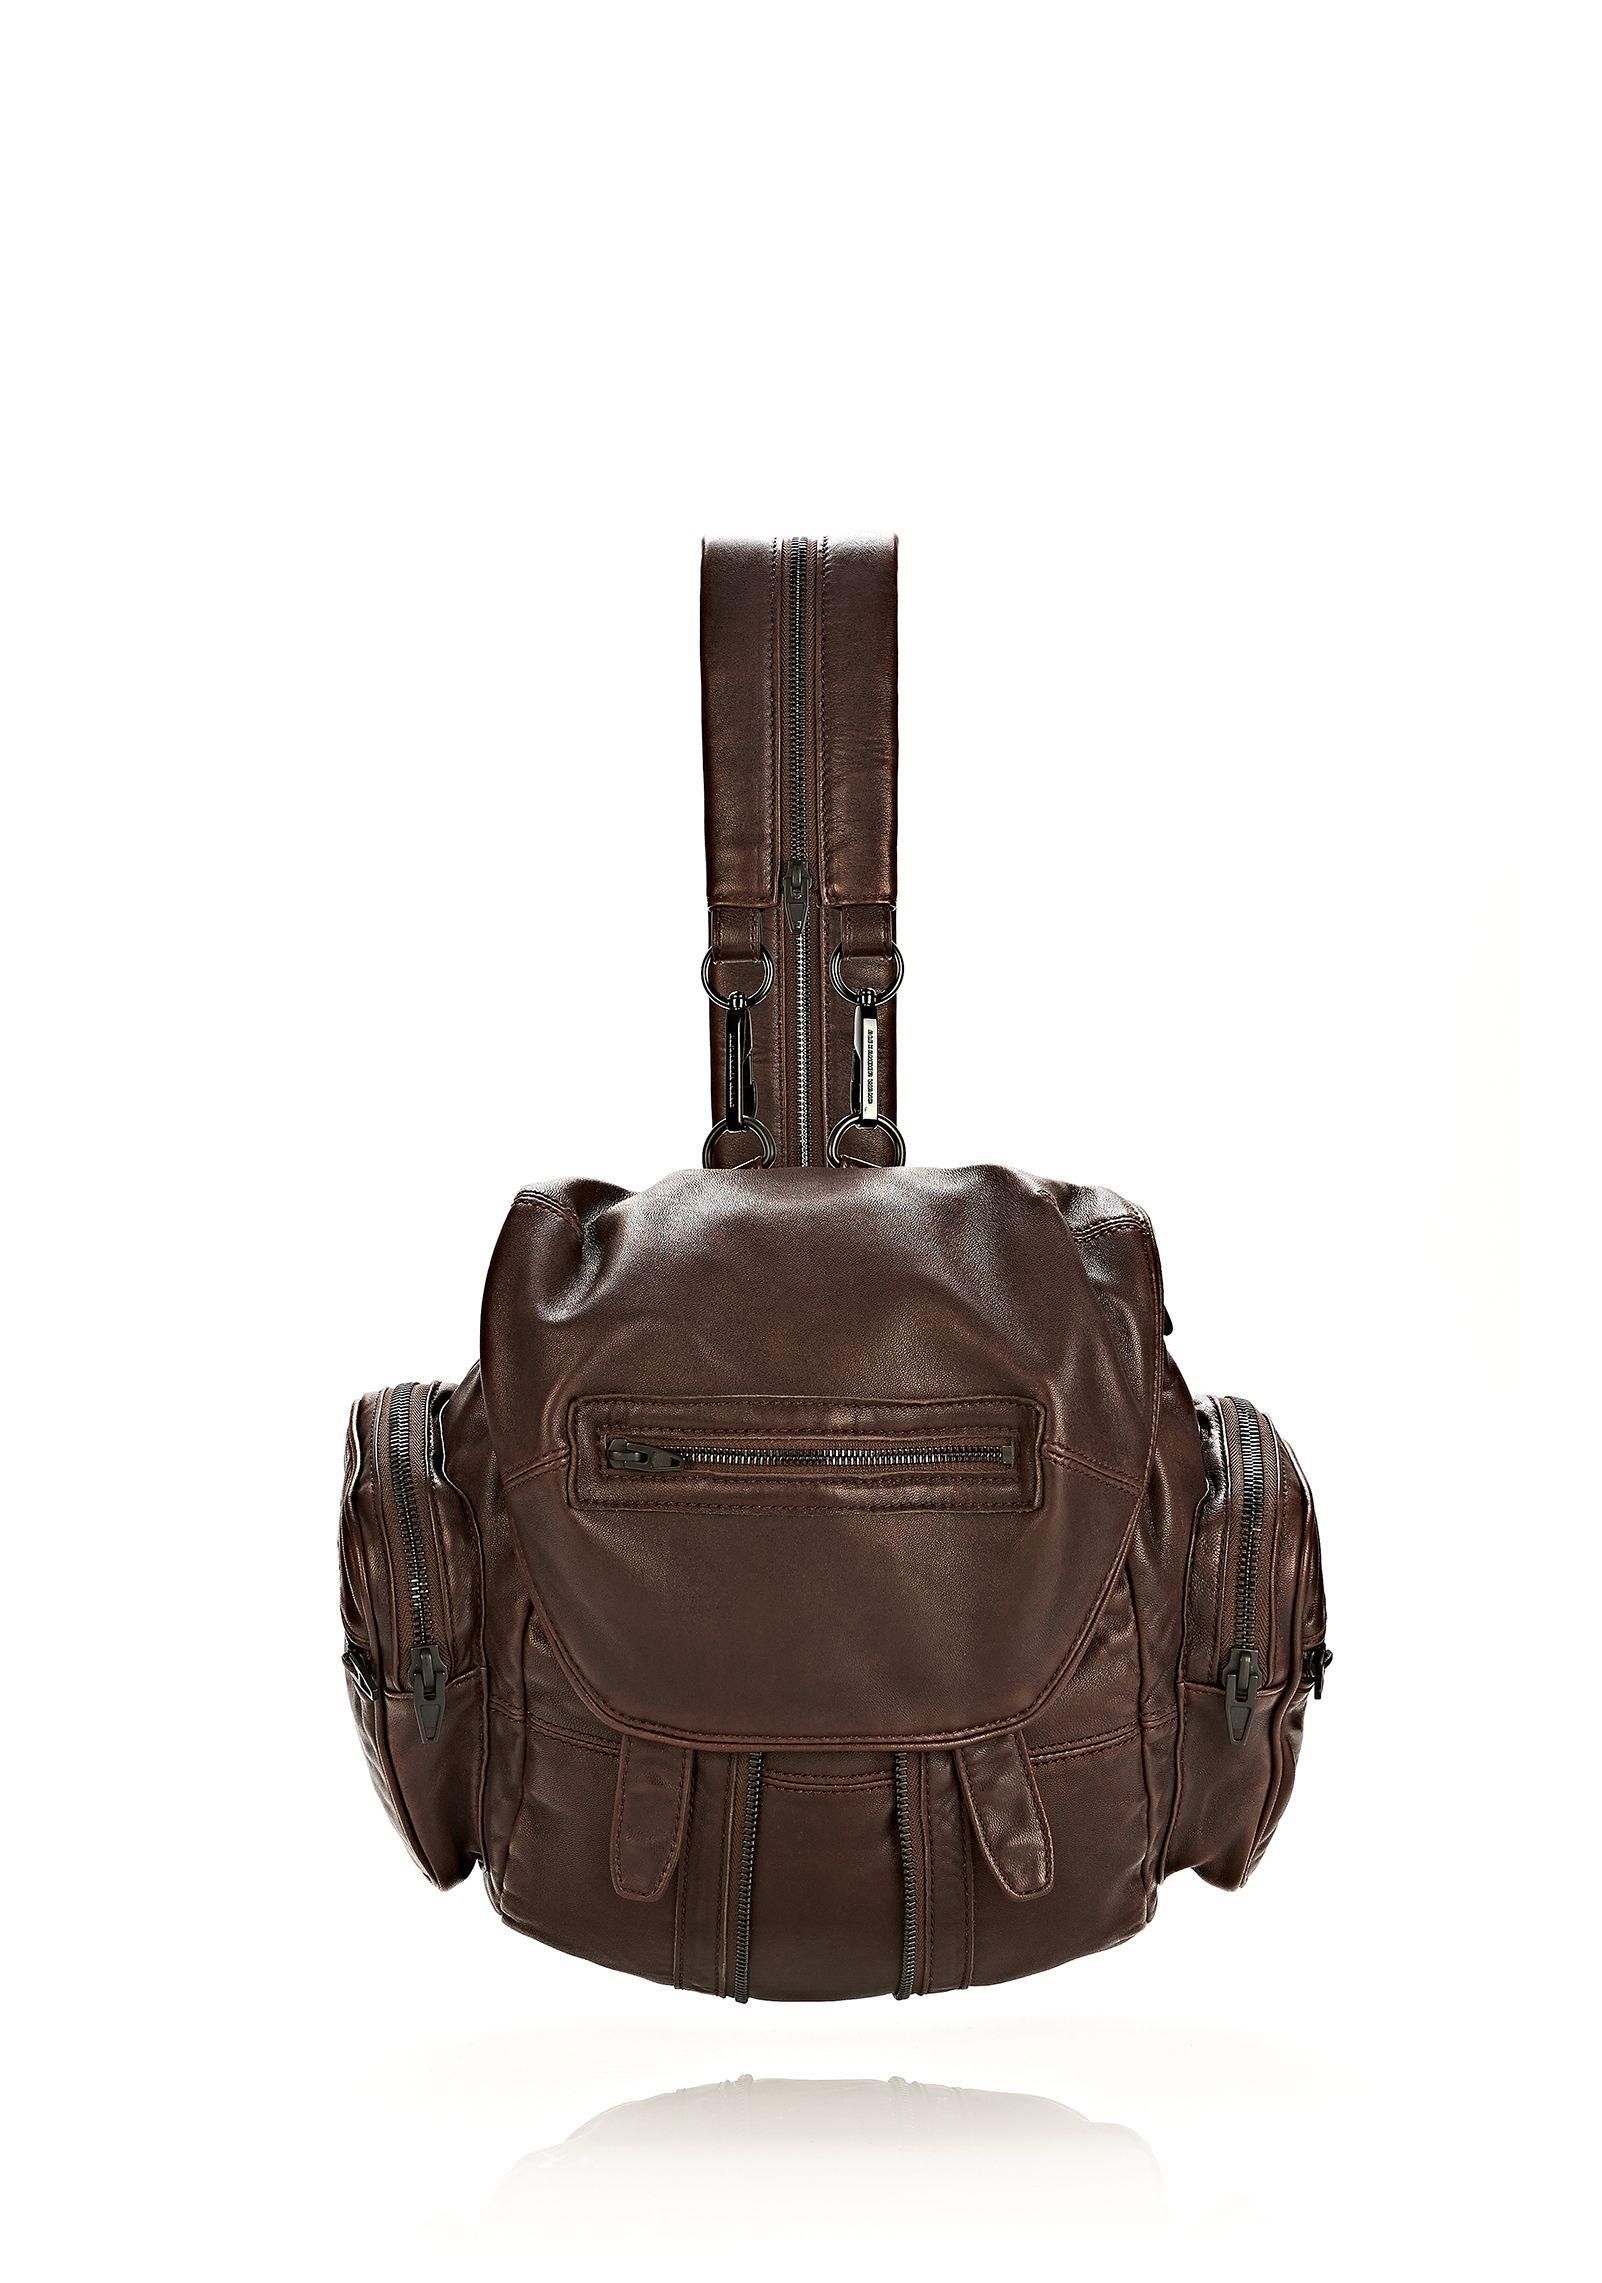 mini marti backpack in espresso with matte black zaini donna su alexander wang online store. Black Bedroom Furniture Sets. Home Design Ideas